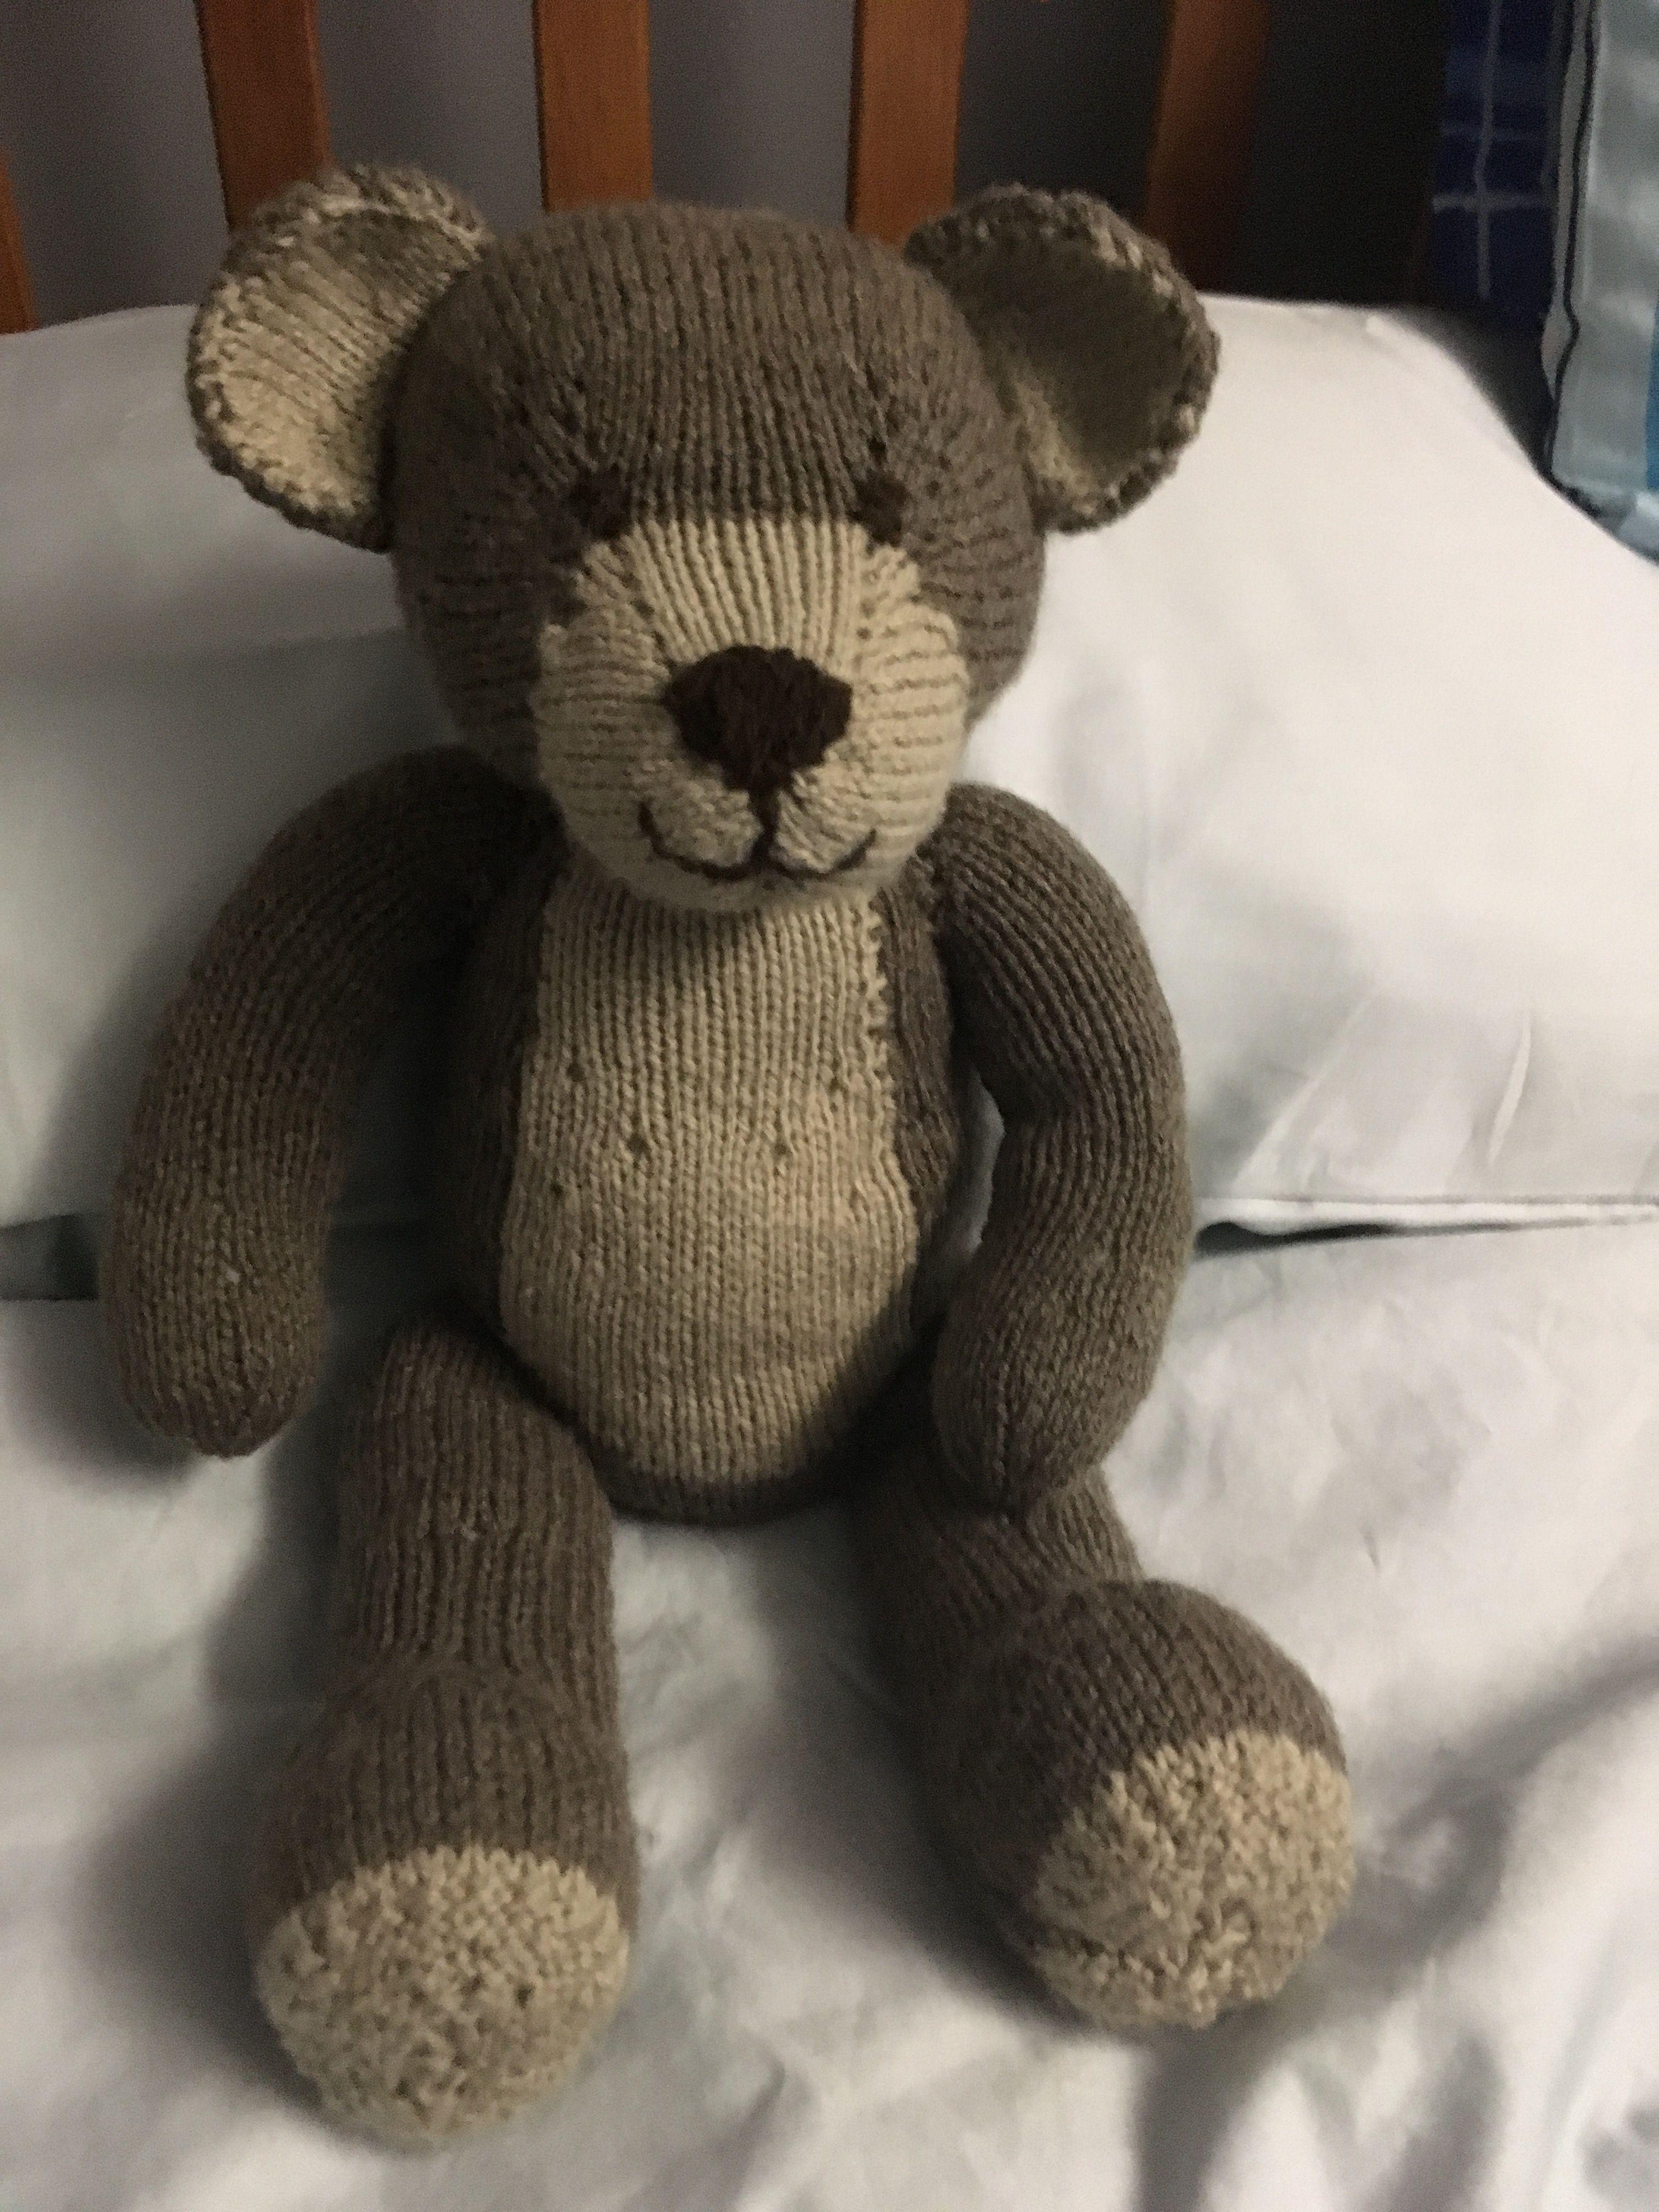 Knittables teddy knitting pinterest bear knit a teddy knitting pattern by knitables bankloansurffo Choice Image